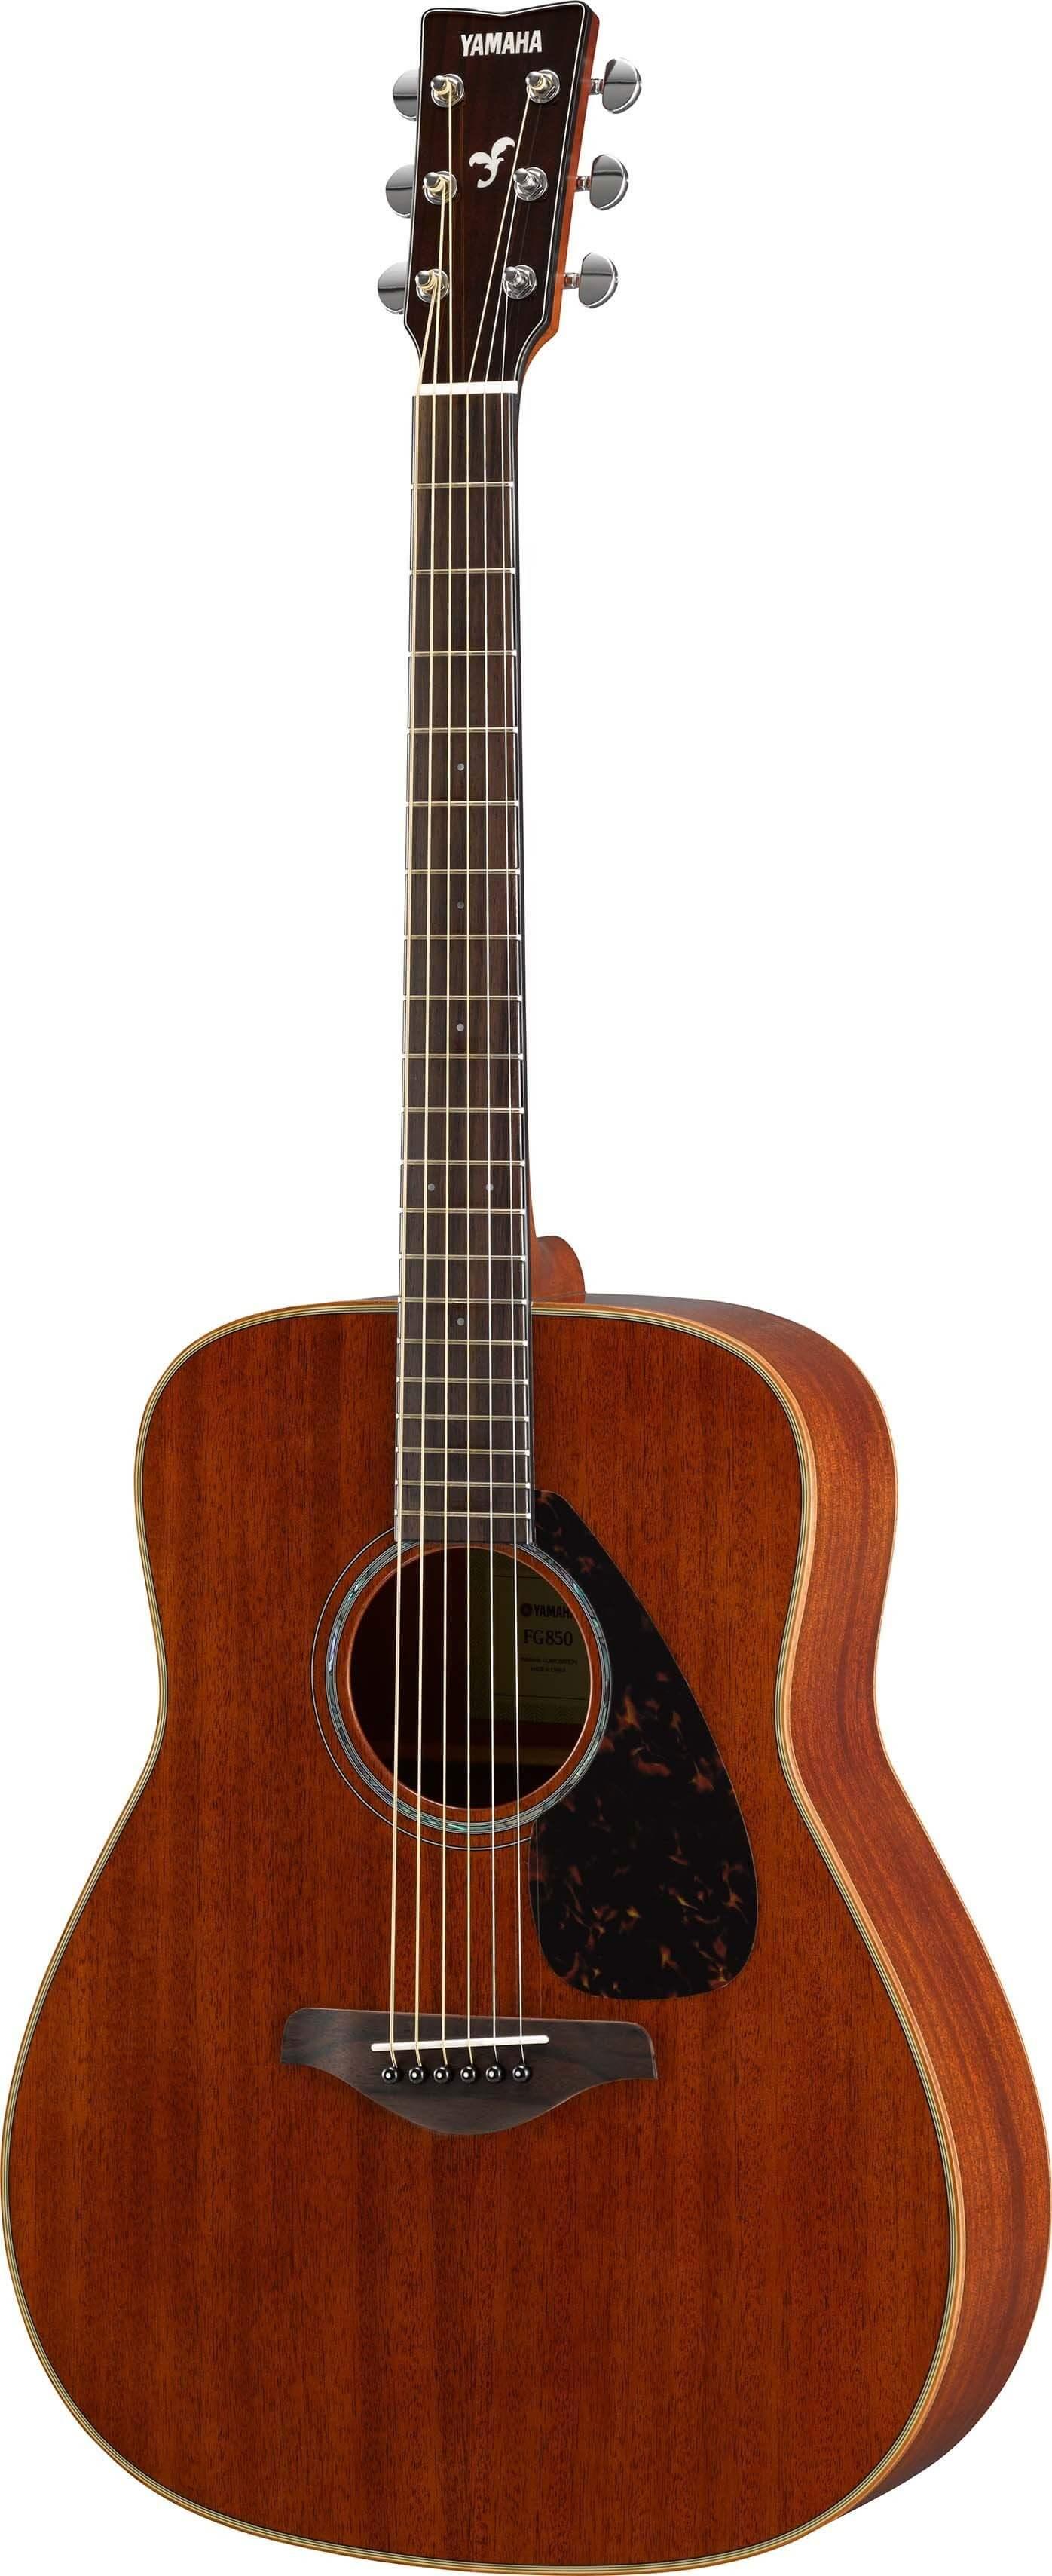 Guitarra Acústica Yamaha FG850 Natural